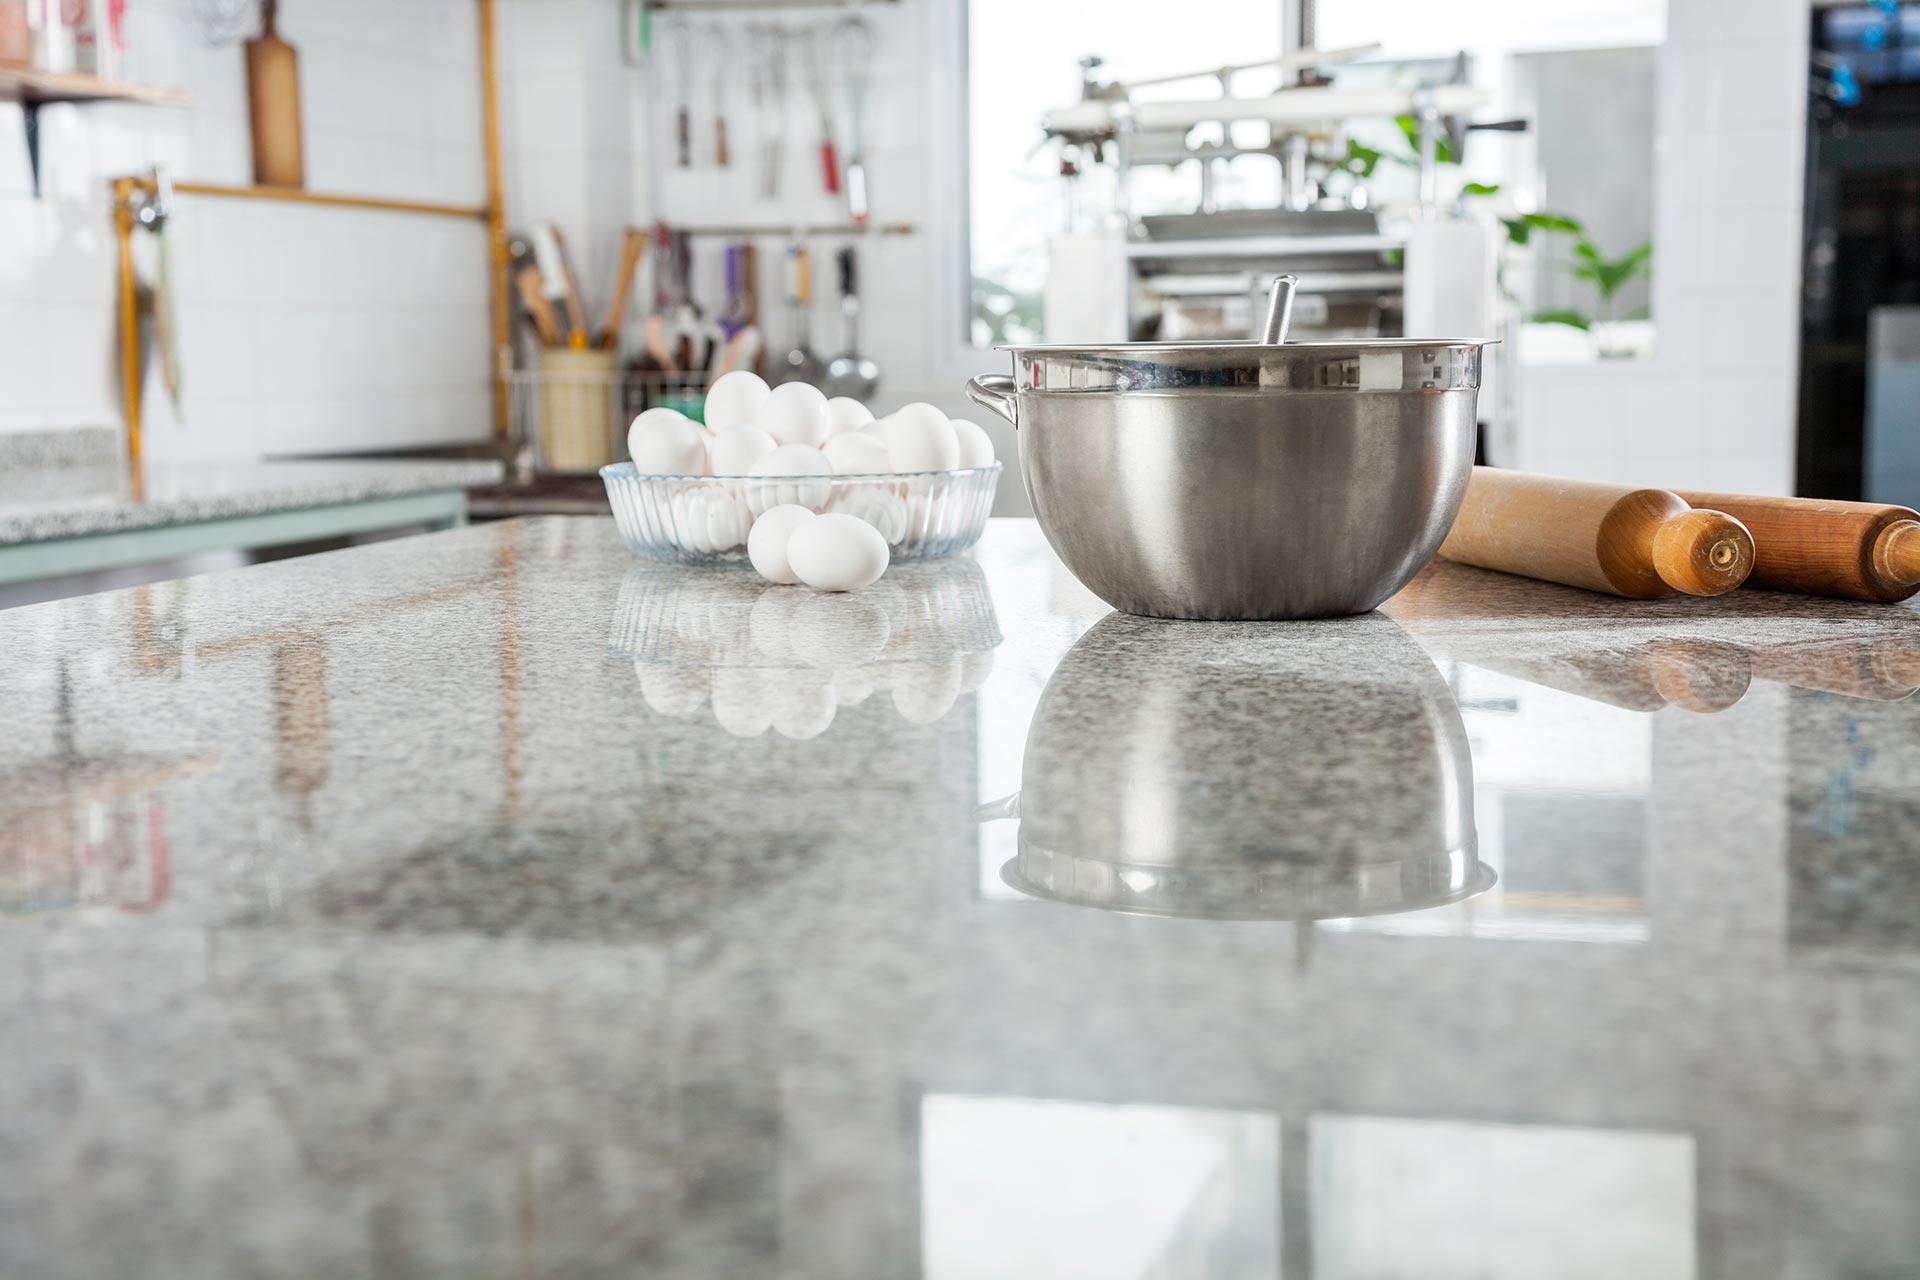 Porcelain kitchen countertop